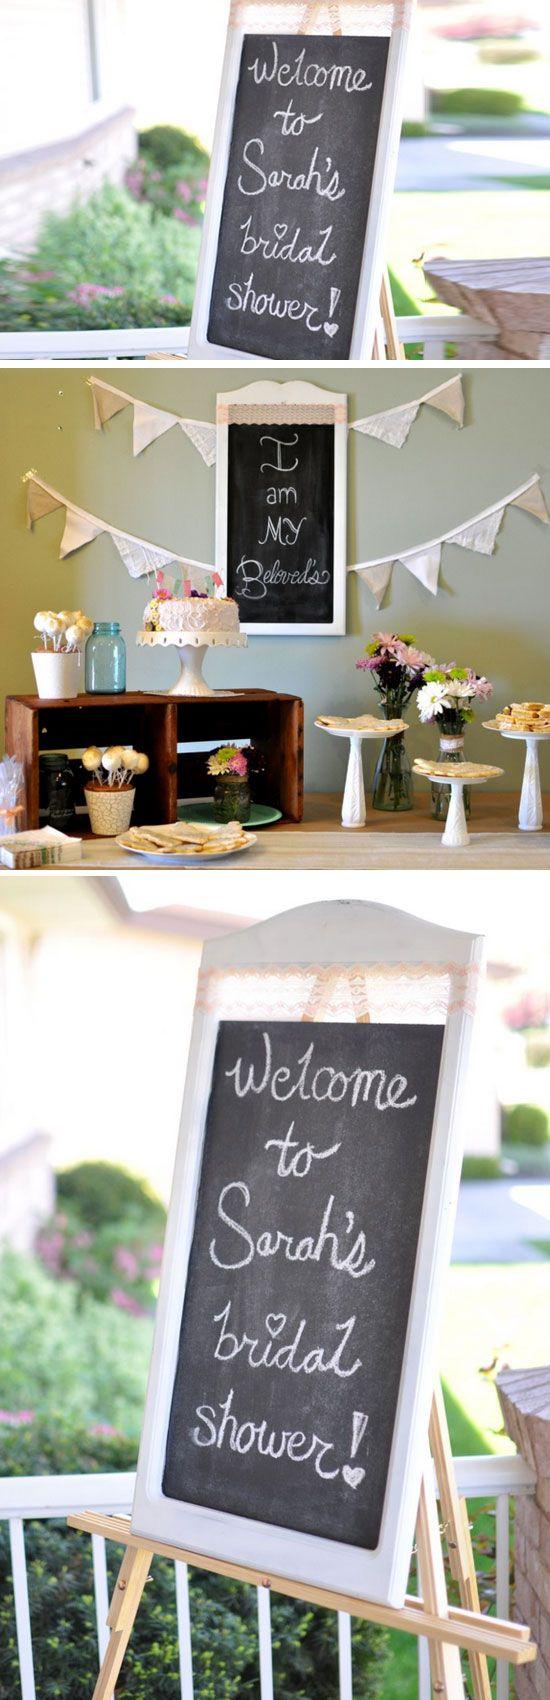 25 diy bridal shower party decorations ideas pinterest diy